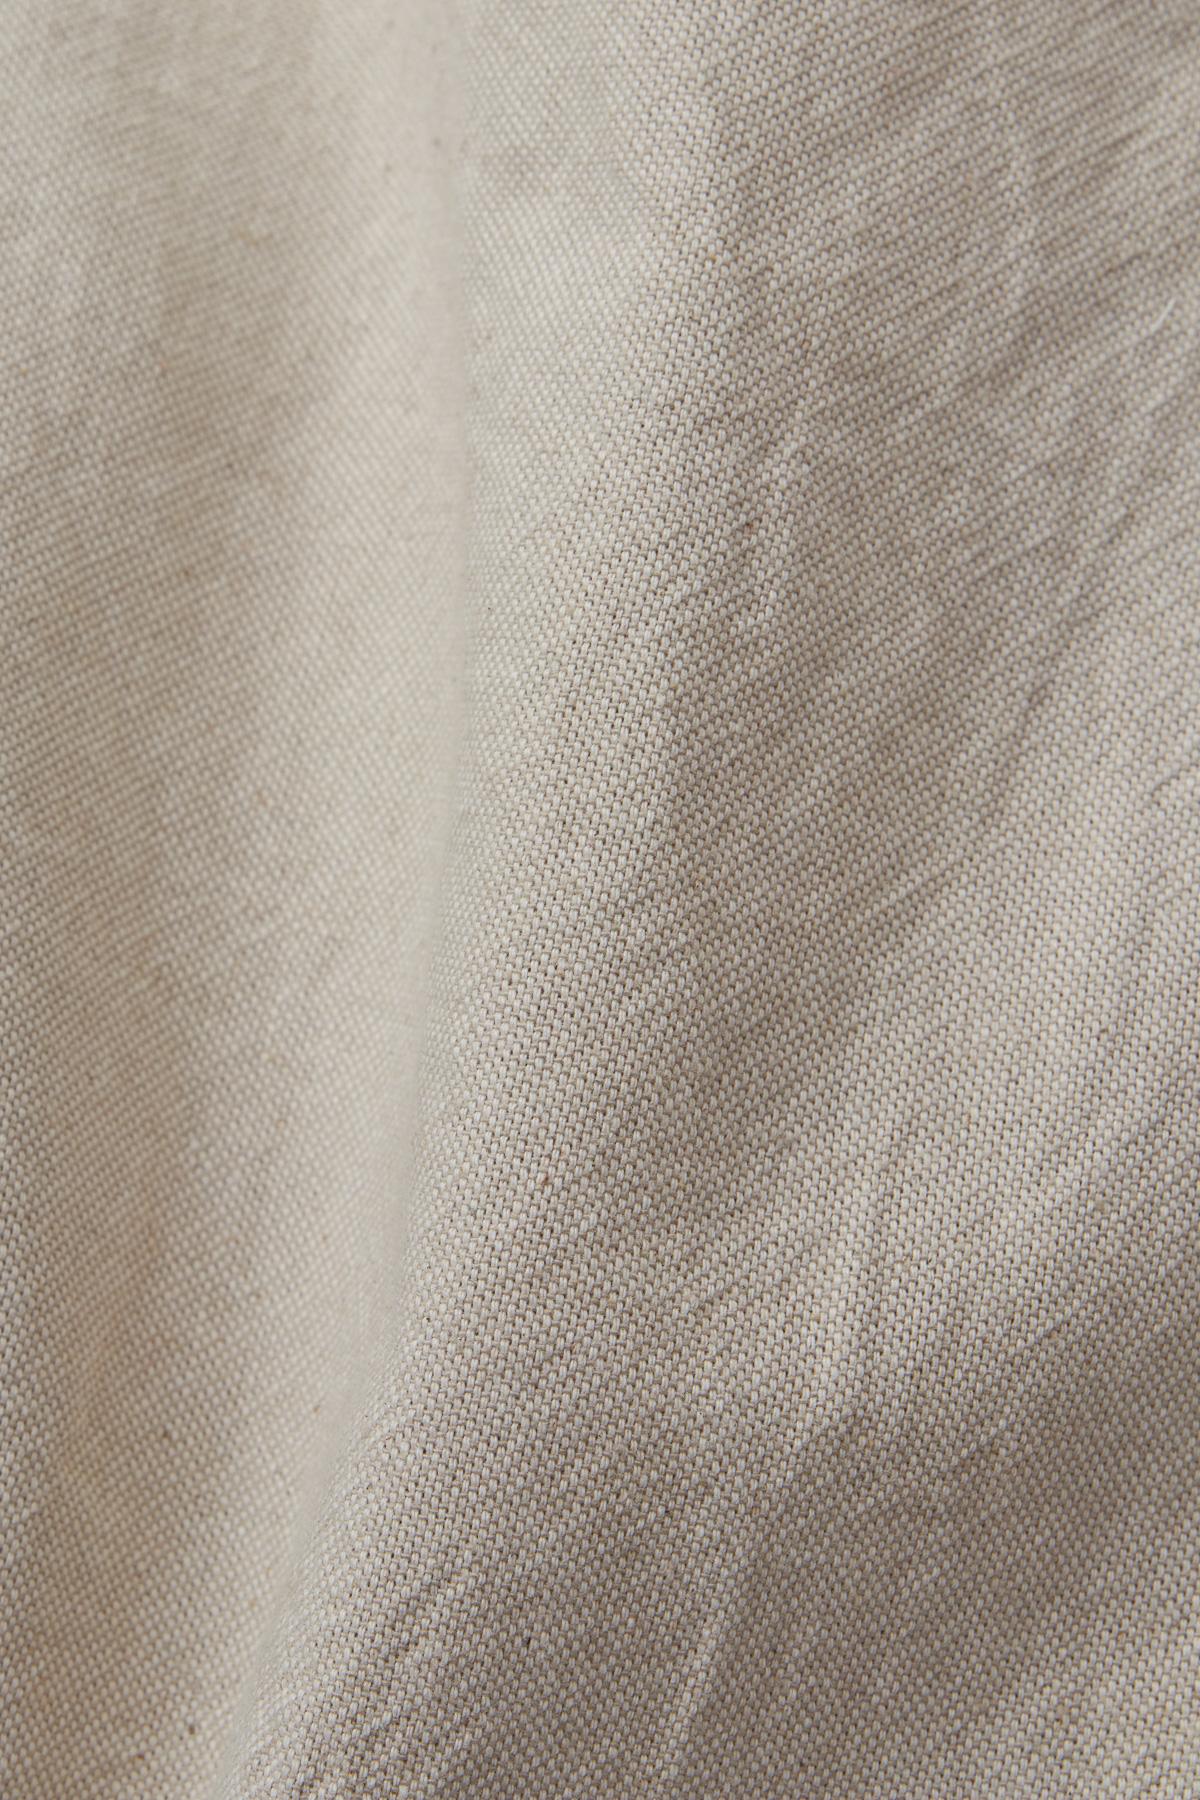 asir jacket, canvas sand, herren - aco